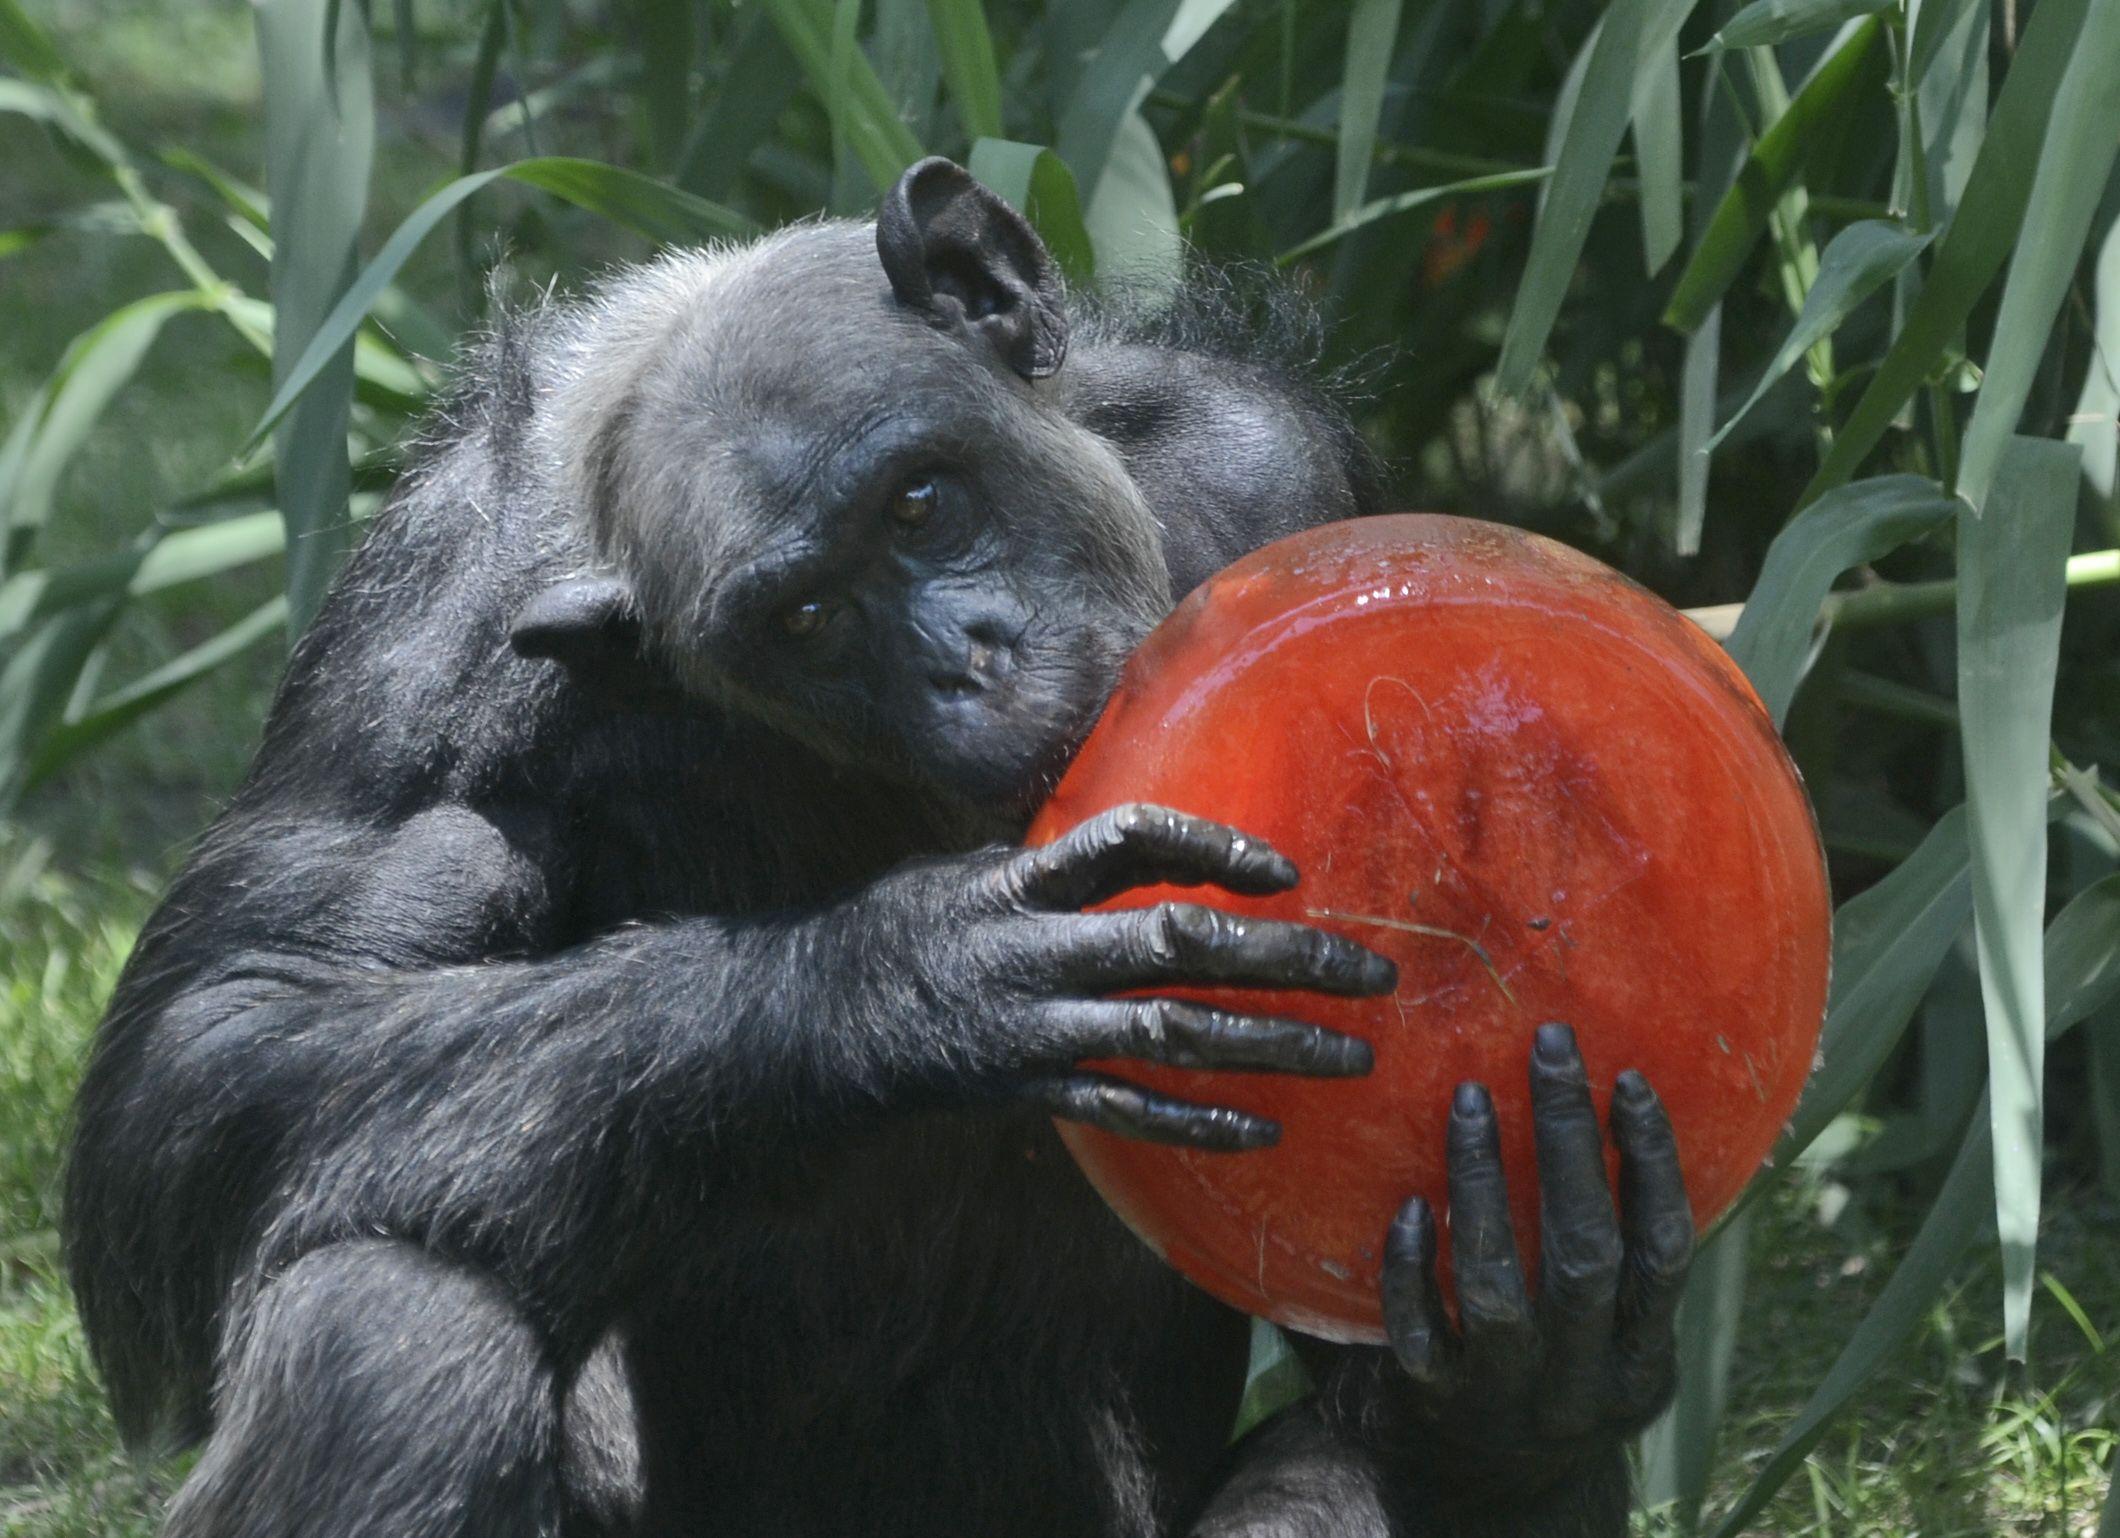 Zoo Animals Keep Their Cool | Nature | Animals, Zoo animals